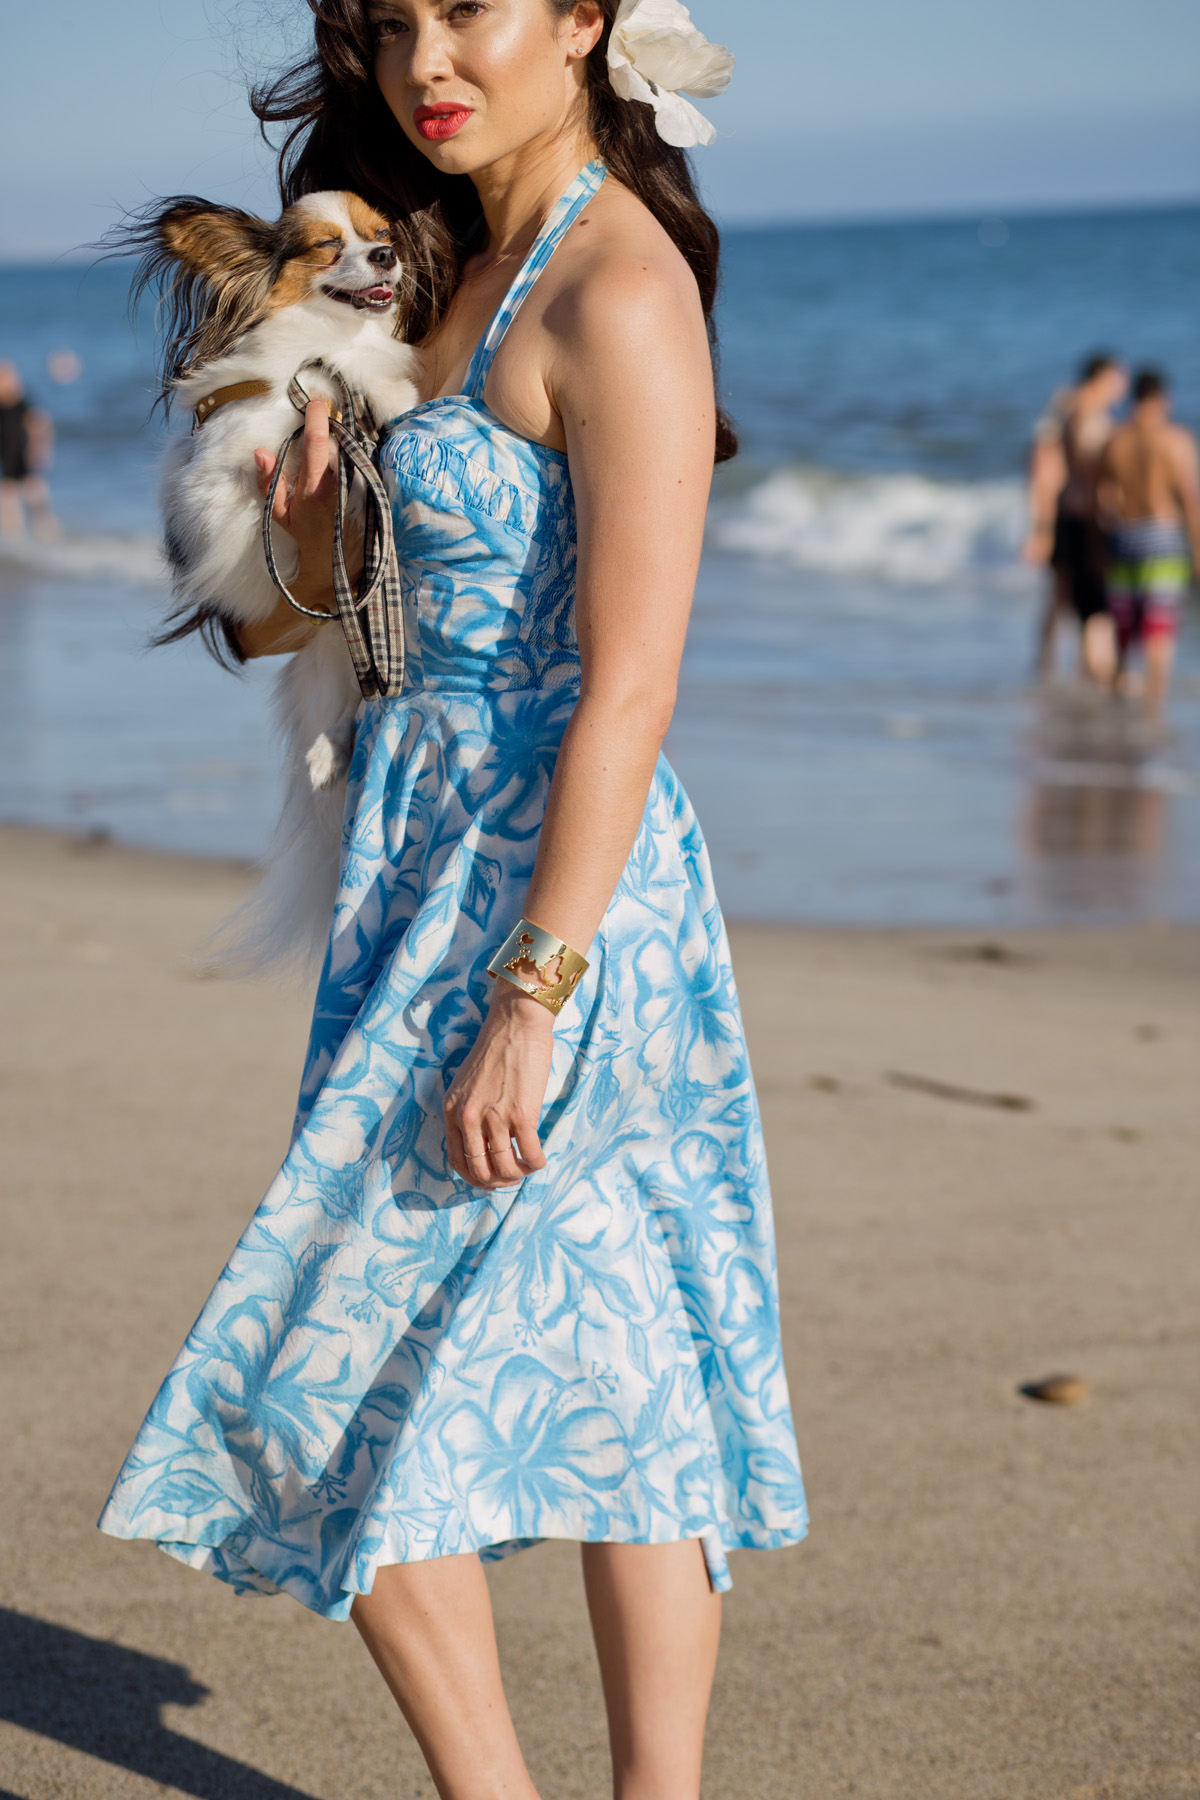 vintage hawaiian dresses, vintage hawaiian dress, hawaiian dress, blue hawaiian dress, vintage blue hawaiian dress, vintage blue dress, vintage halter dress, vintage blue halter dress, vintage floral halter dress, vintage blue floral halter dress, model hair wind, long hair wind, model beach rocks, dog beach rocks, will rogers beach, will rogers beach photo shoot, will rogers beach modeling, modeling beach, model beach, model dog beach, los angeles beaches, best la beach, best la beaches, best los angeles beach, best los angeles beaches, model walking beach, dress walking beach, dog walking beach, dog model walking, dog model walking beach, walking beach, gown walking beach, hair walking beach, michele lobosco, photographer michele lobosco, street style, model street style, beach los angeles fashion, beach fashion, los angeles fashion, bodychain, gold bodychain, body chain, gold body chain, street style, street style la, street style los angeles, ootd, perfect blowout, model eyelashes, model perfect lips, artelier globe cuff, artelier map cuff, bodychain, body chain, gold bodychain, gold body chain, drybar, blushington, drybar cosmo blowout, drybar model, drybar blowout, blushington makeup, off duty model style, los angeles style, camille newbern, papillon, the la survival guide, la survival guide, thelasurvivalguide, lasurvivalguide, eurasian models, eurasian actresses, los angeles fashion blogs, los angeles style blogs, shopping la, shopping los angeles, modeling la, modeling los angeles, long hair blowout, smile model, modeling smile, dog smile, papillon, papillon dog, los angeles photo shoot, model on dog walk, dog and model, camille newbern, camille hom newbern, imjudgingyou, pipthepap